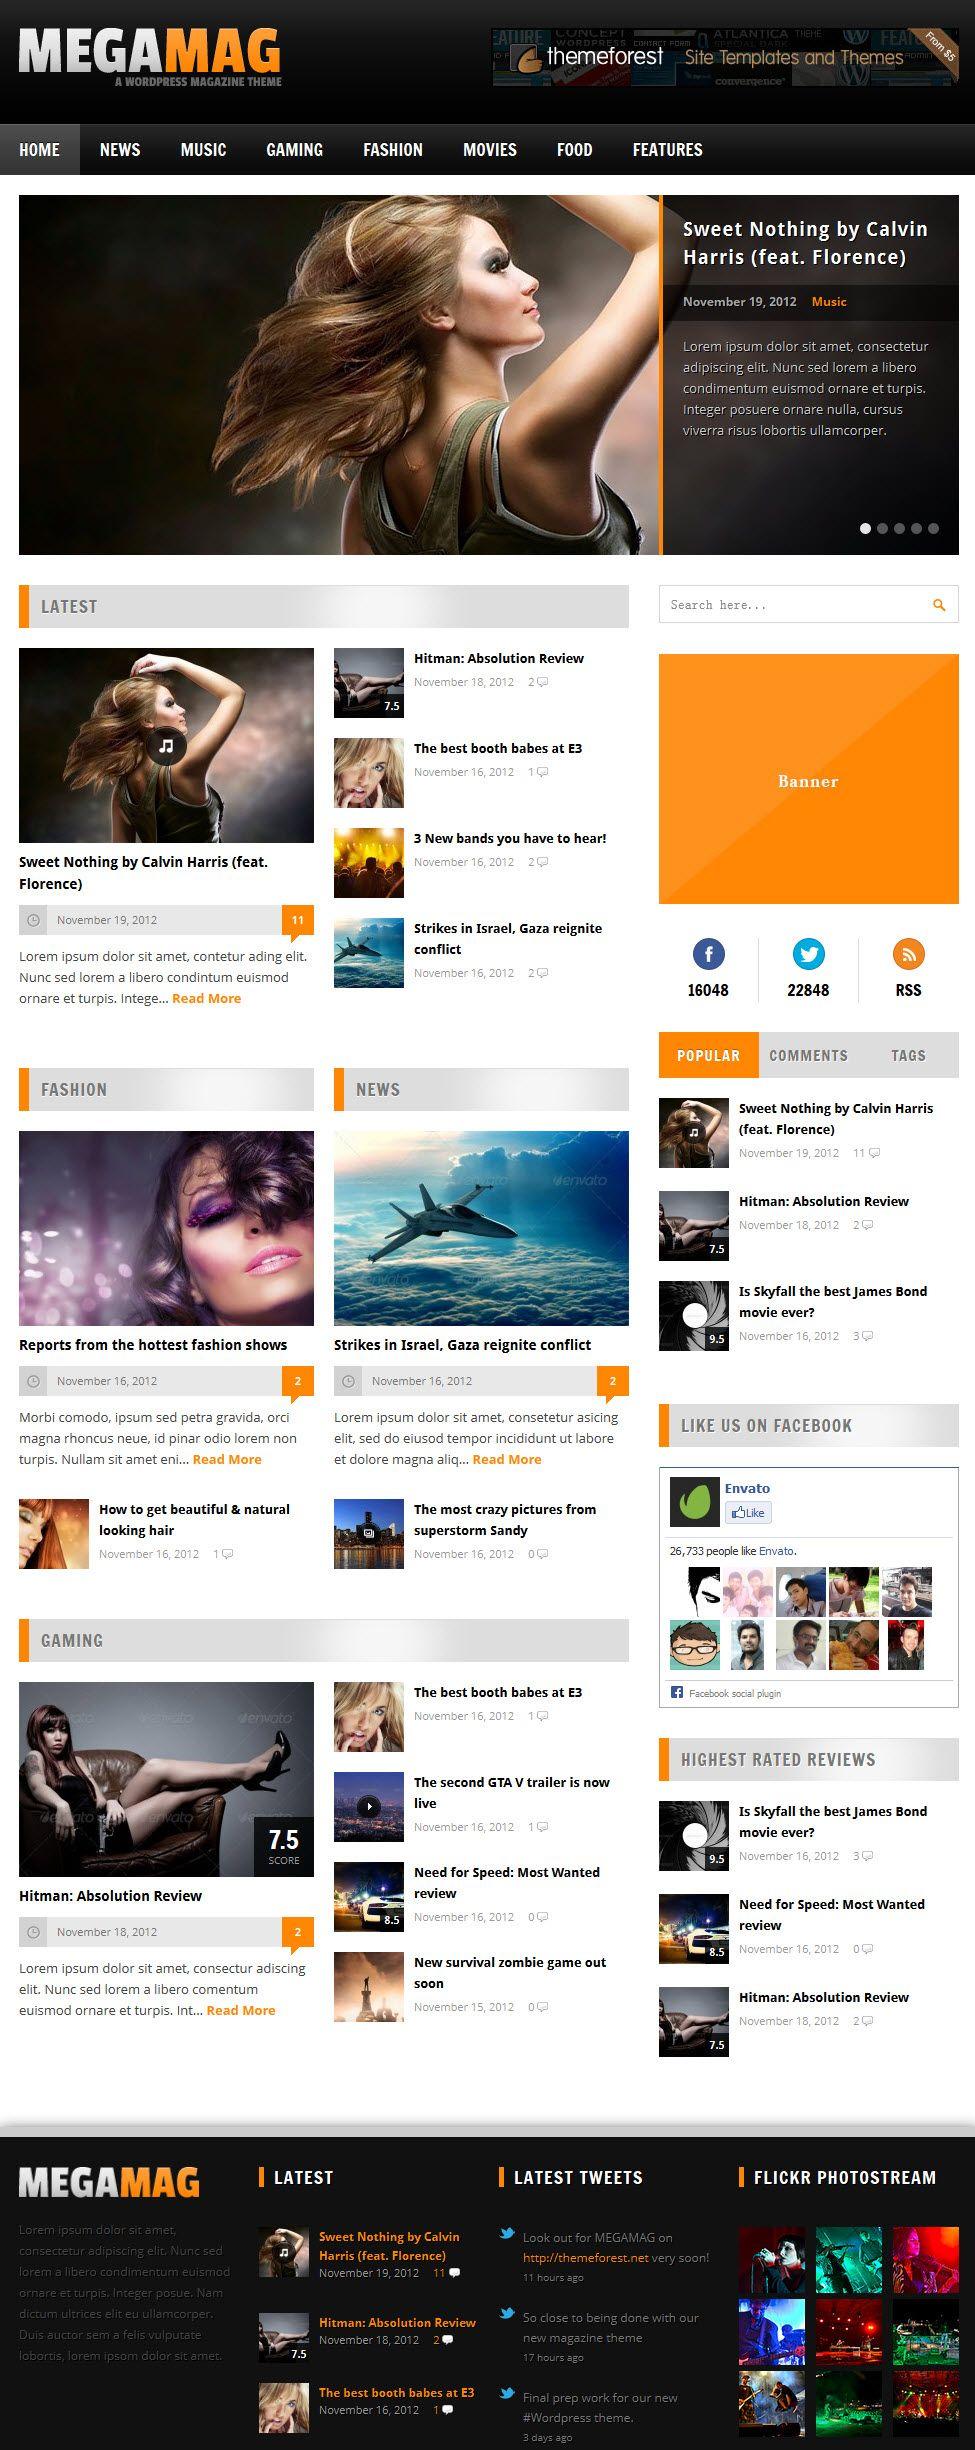 Megamag Magazine Theme Highlighting Comment Box Magazine Theme Wordpress Free Wordpress Themes Premium Wordpress Themes